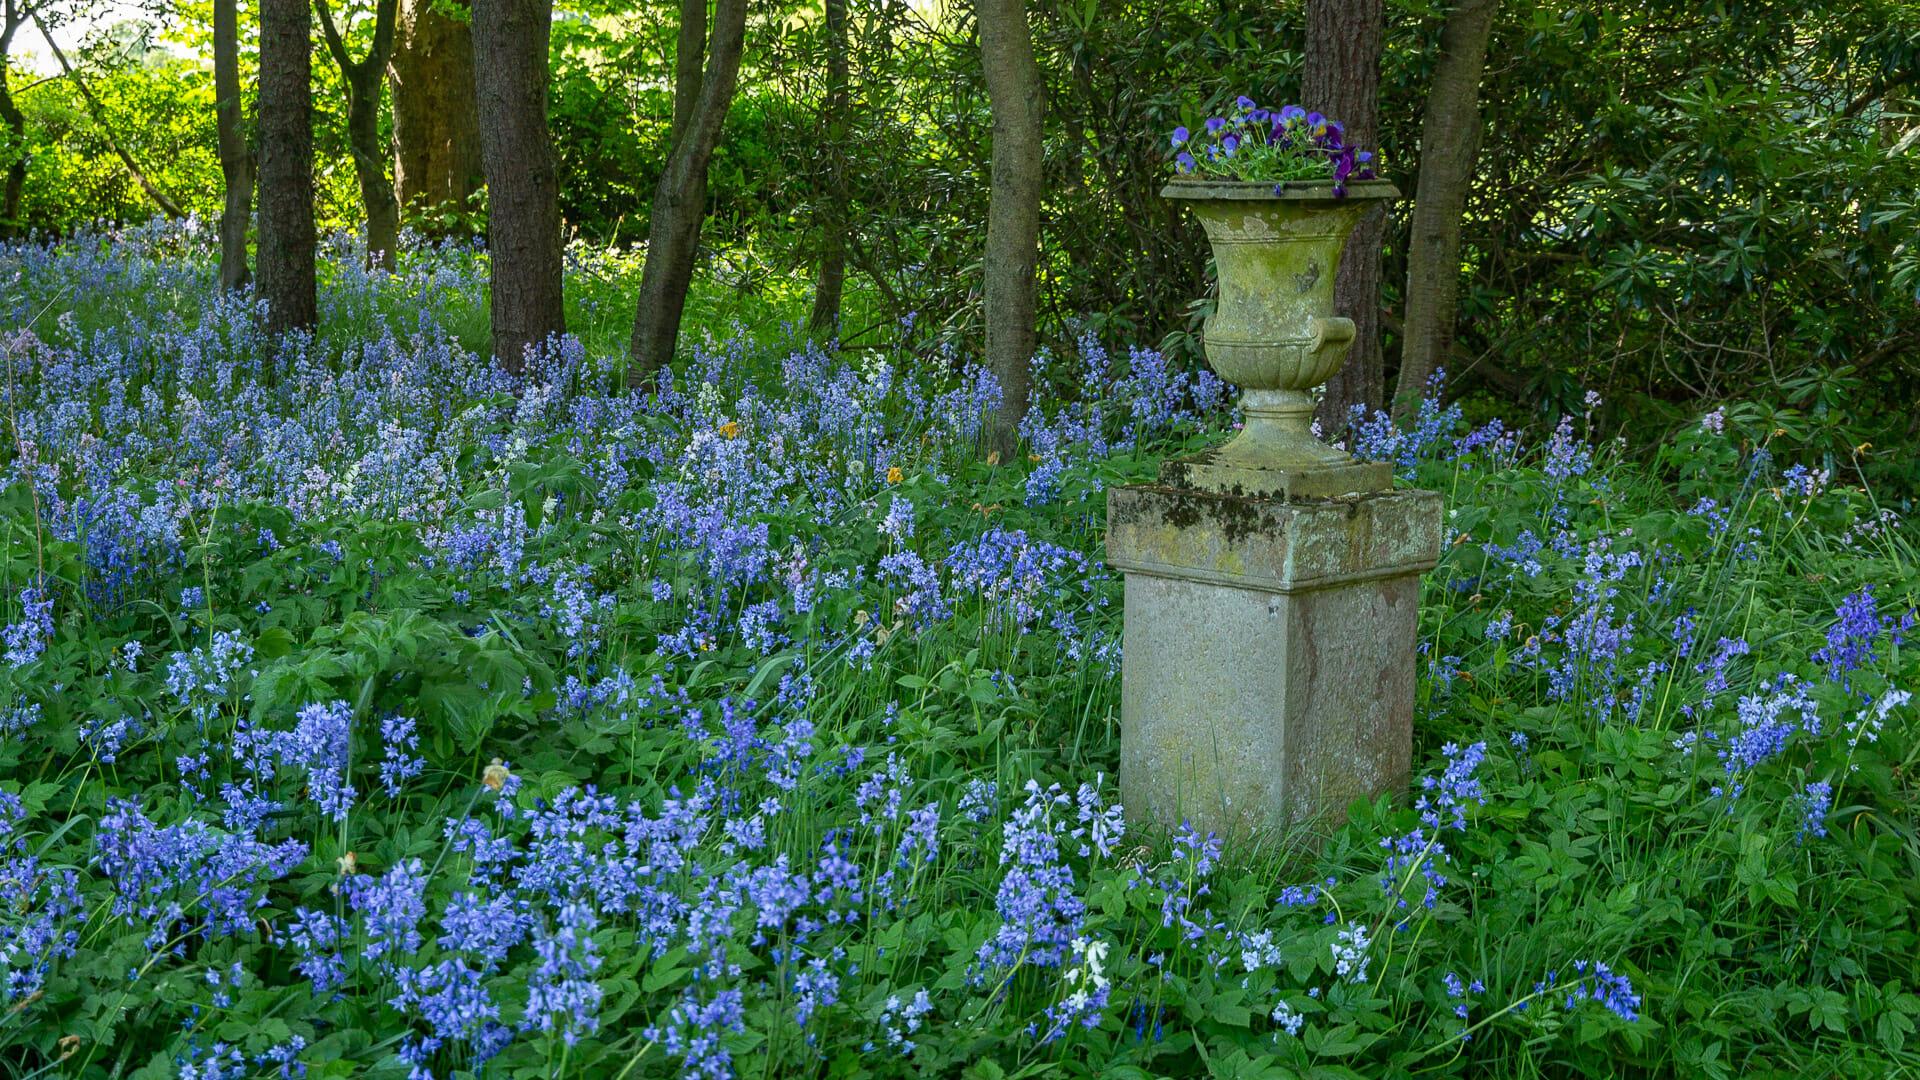 Bluebells im Park